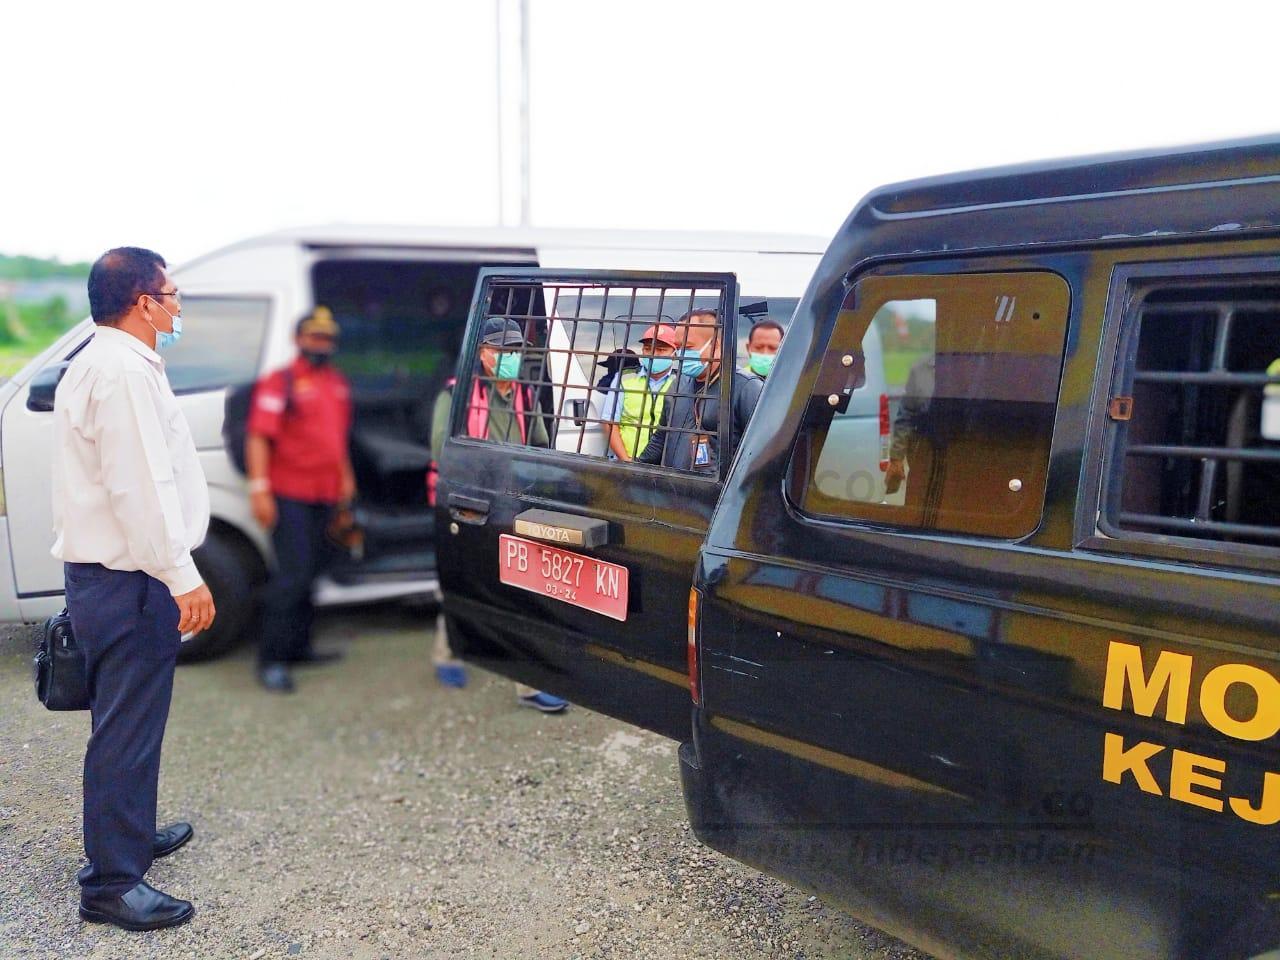 Kabur ke Jakarta, Terpidana Kasus Amdal Teluk Wondama Ini Ditangkap di Cilincing 23 IMG 20201214 WA0035